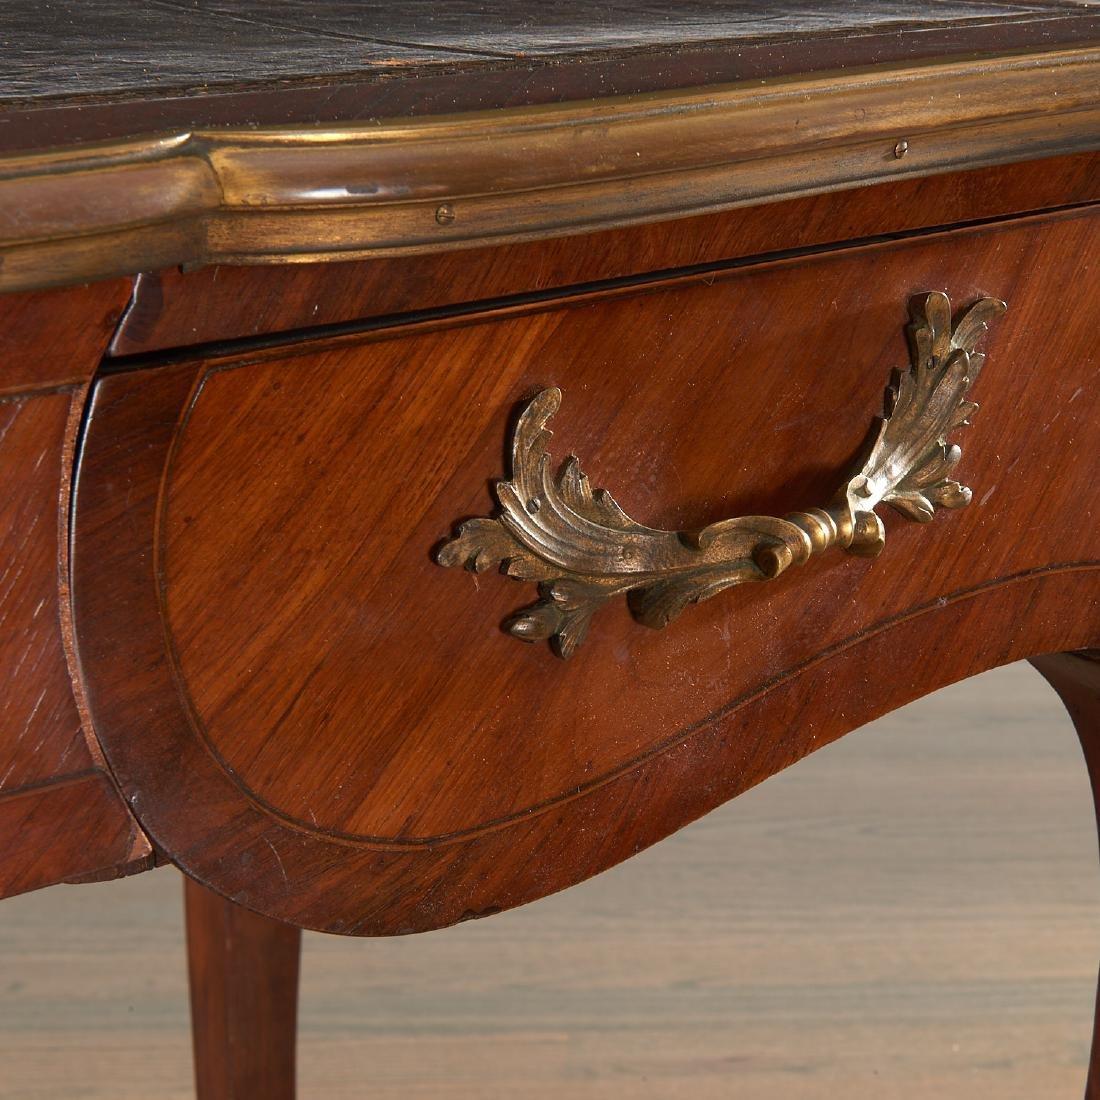 Louix XV bronze mounted mahogany bureau plat - 3